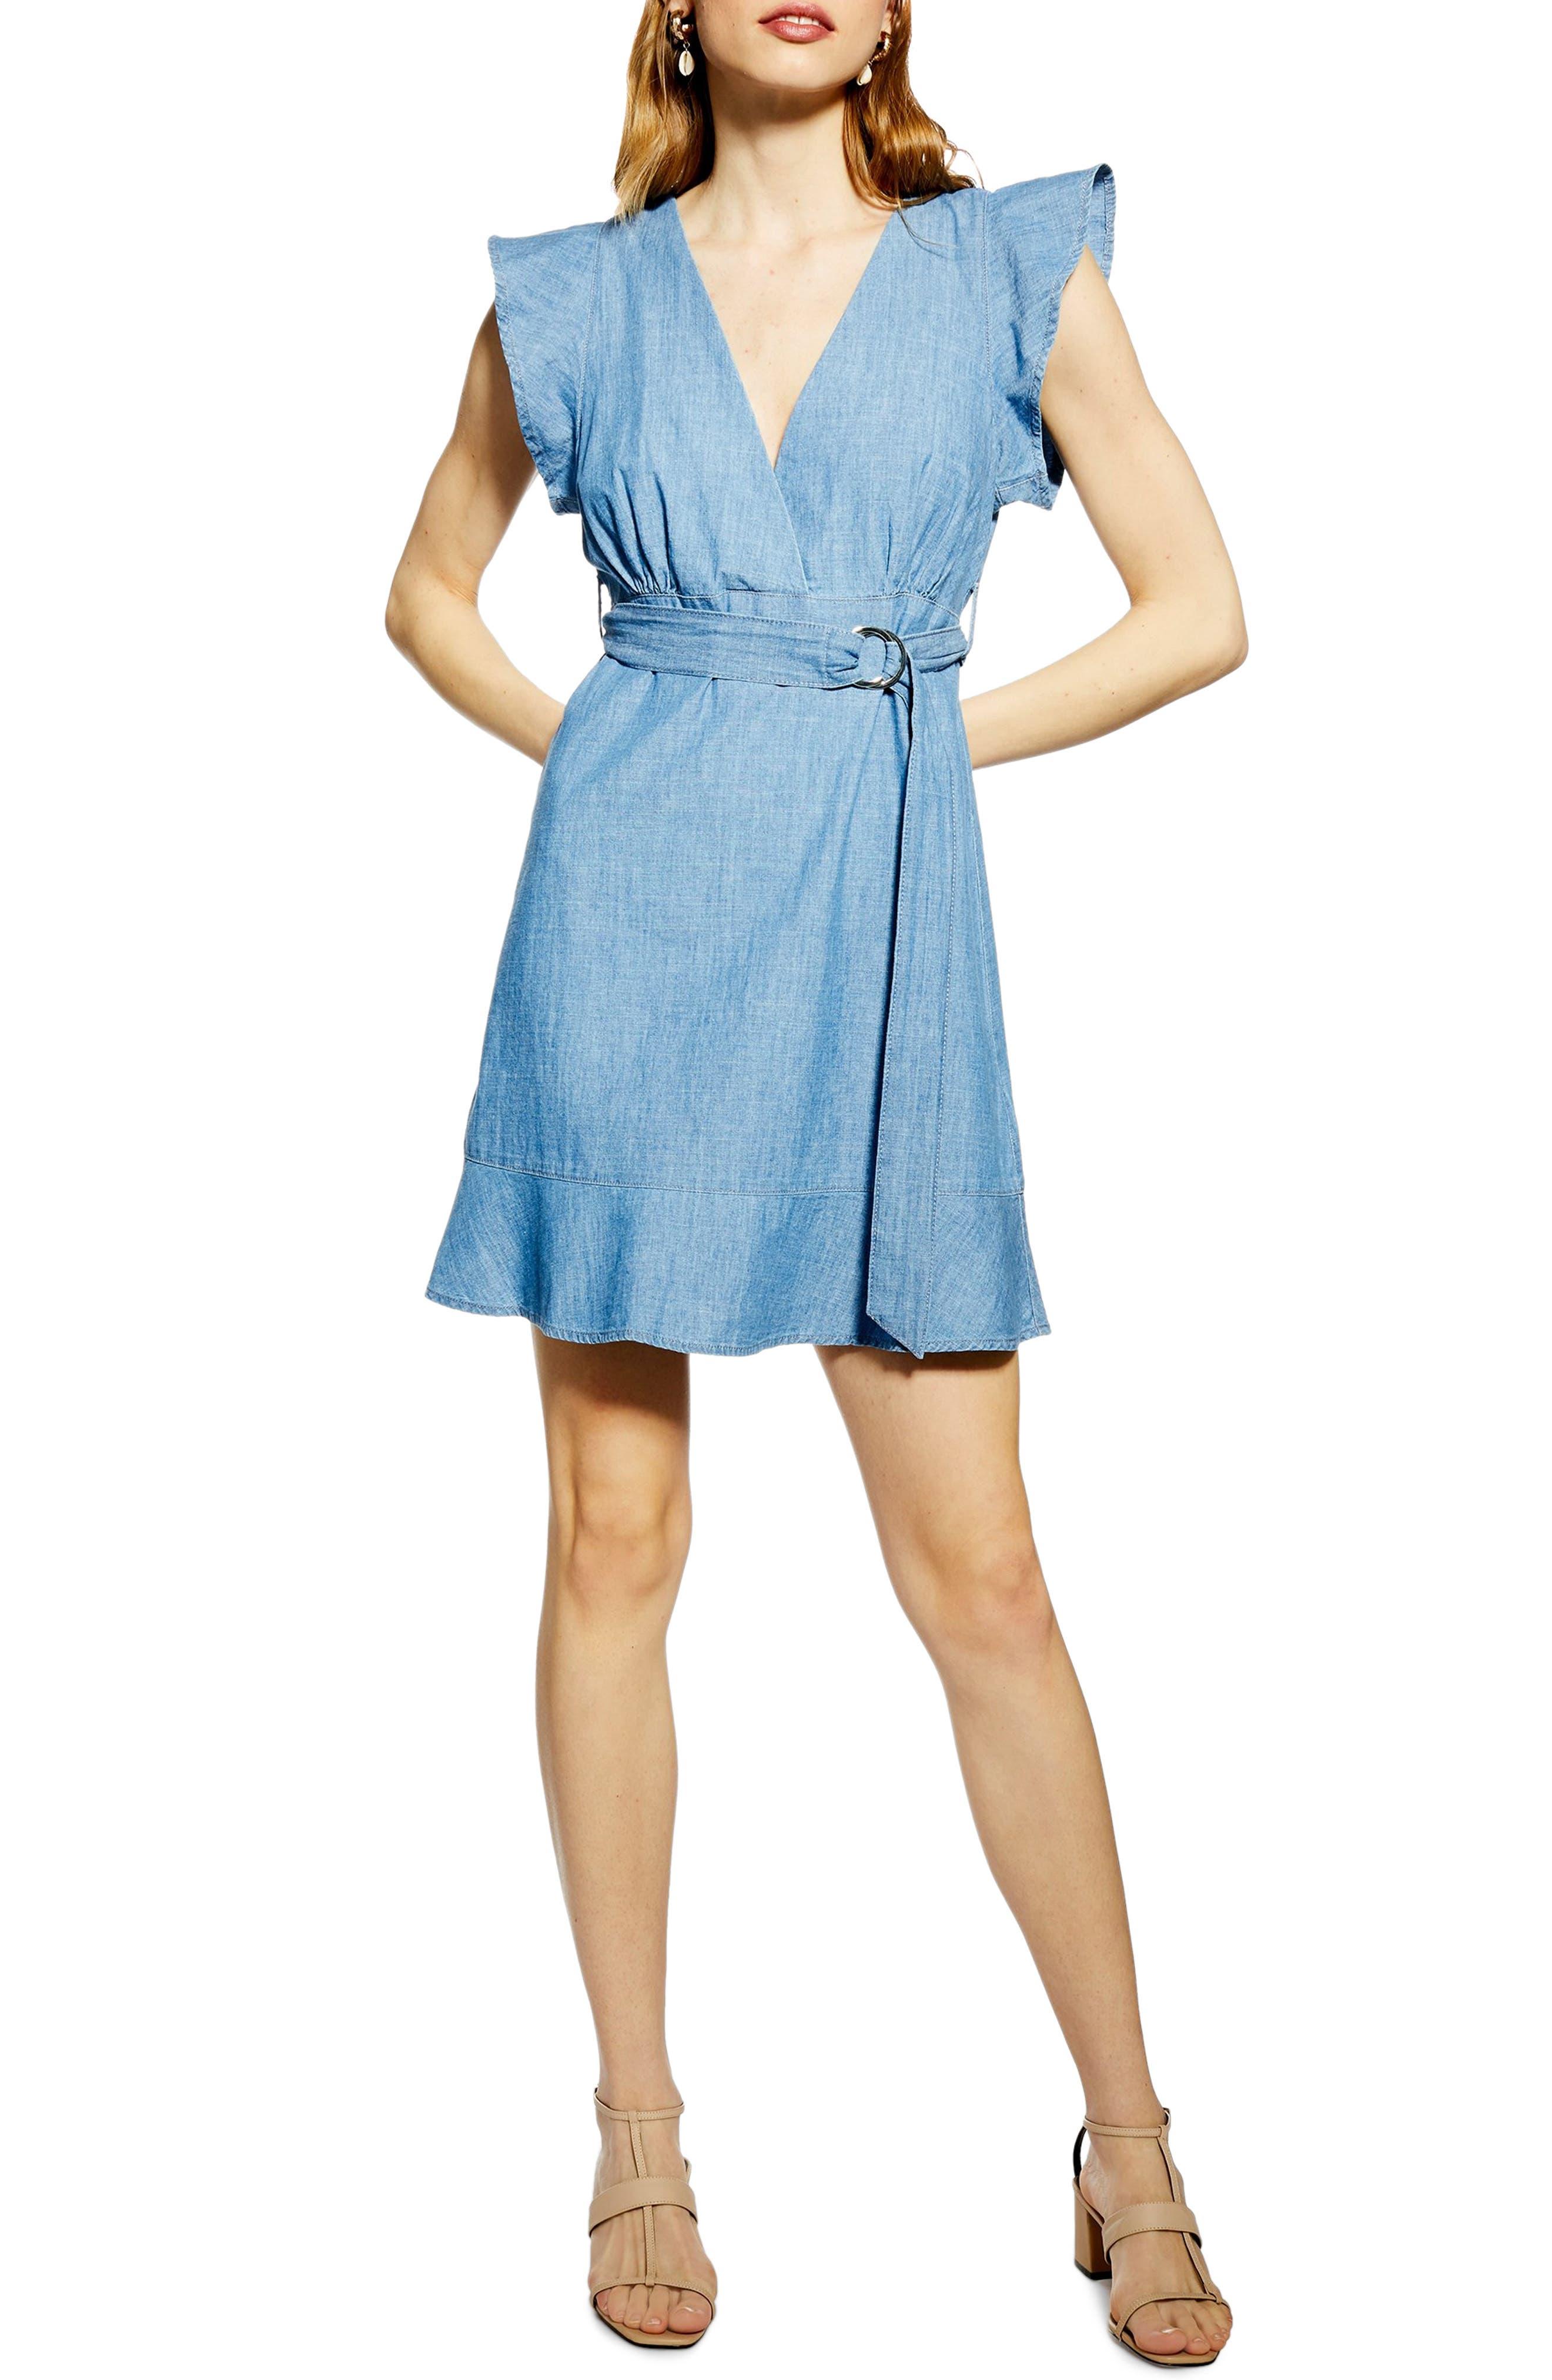 Topshop Flute Belt Minidress, US (fits like 14) - Blue